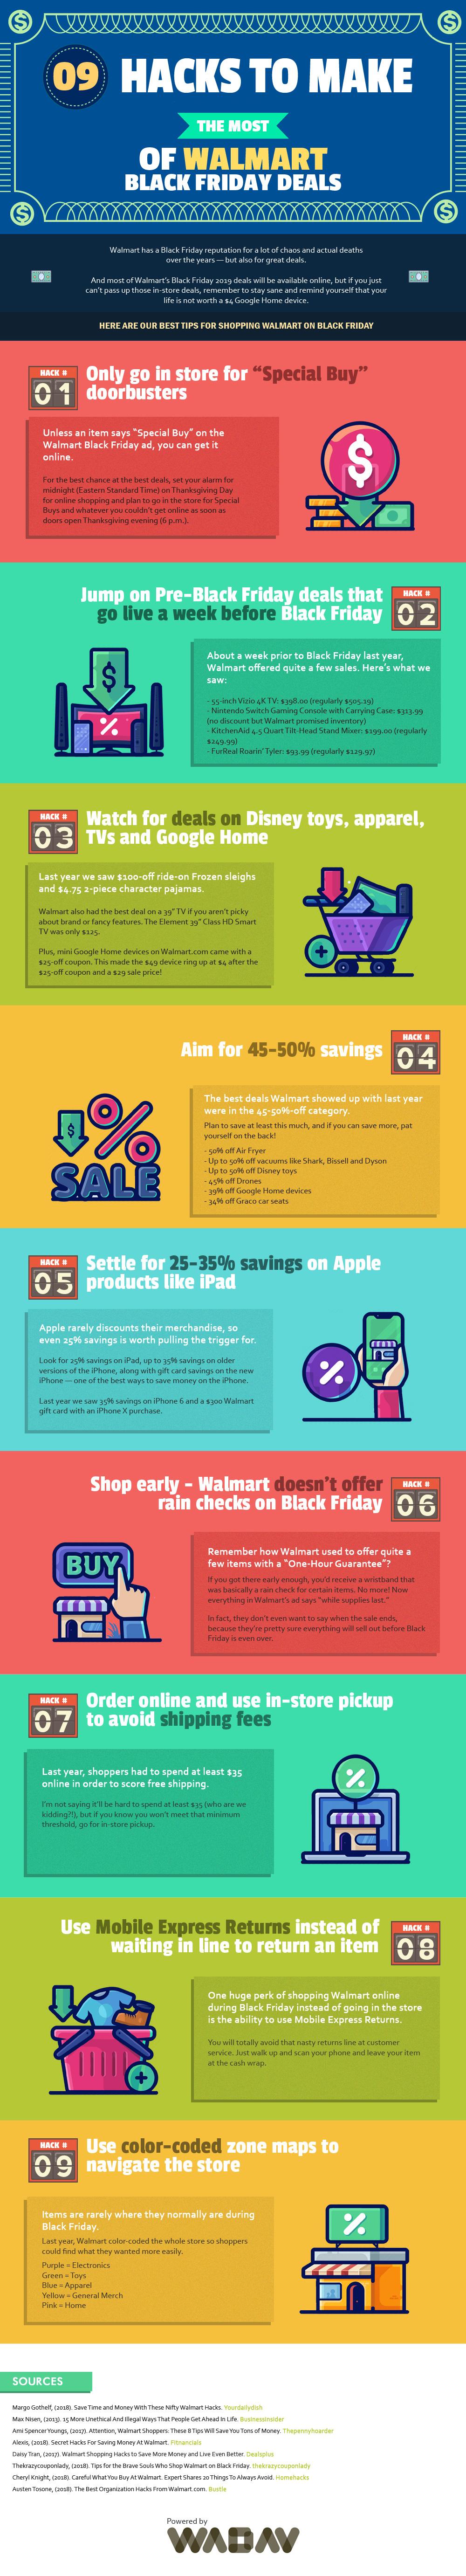 walmart black friday deals infographic